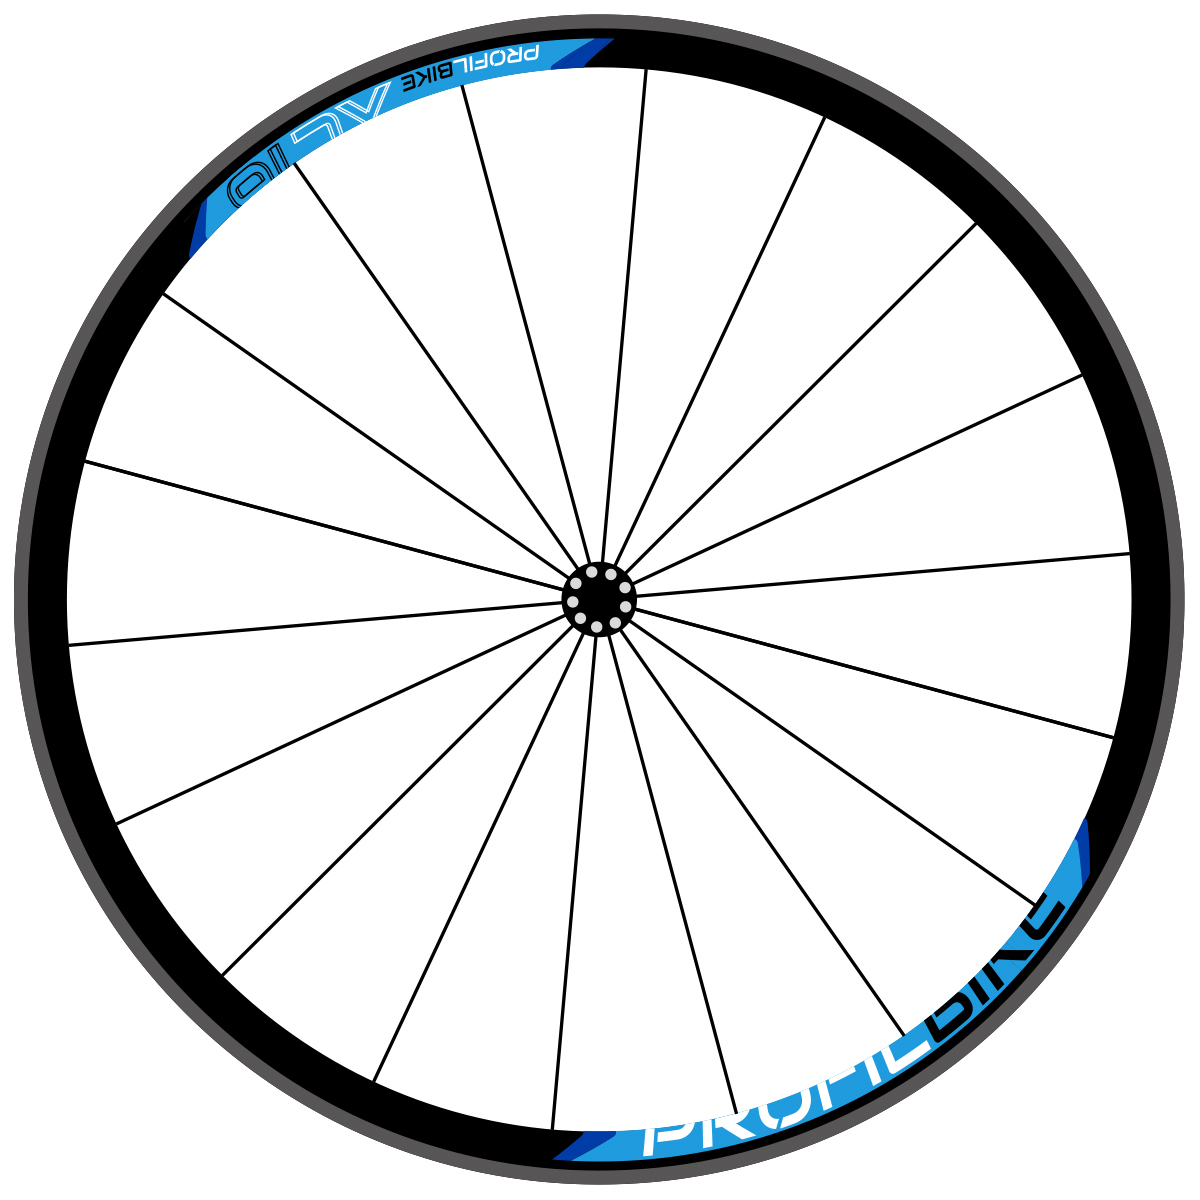 Profilbike XC16 design bleu